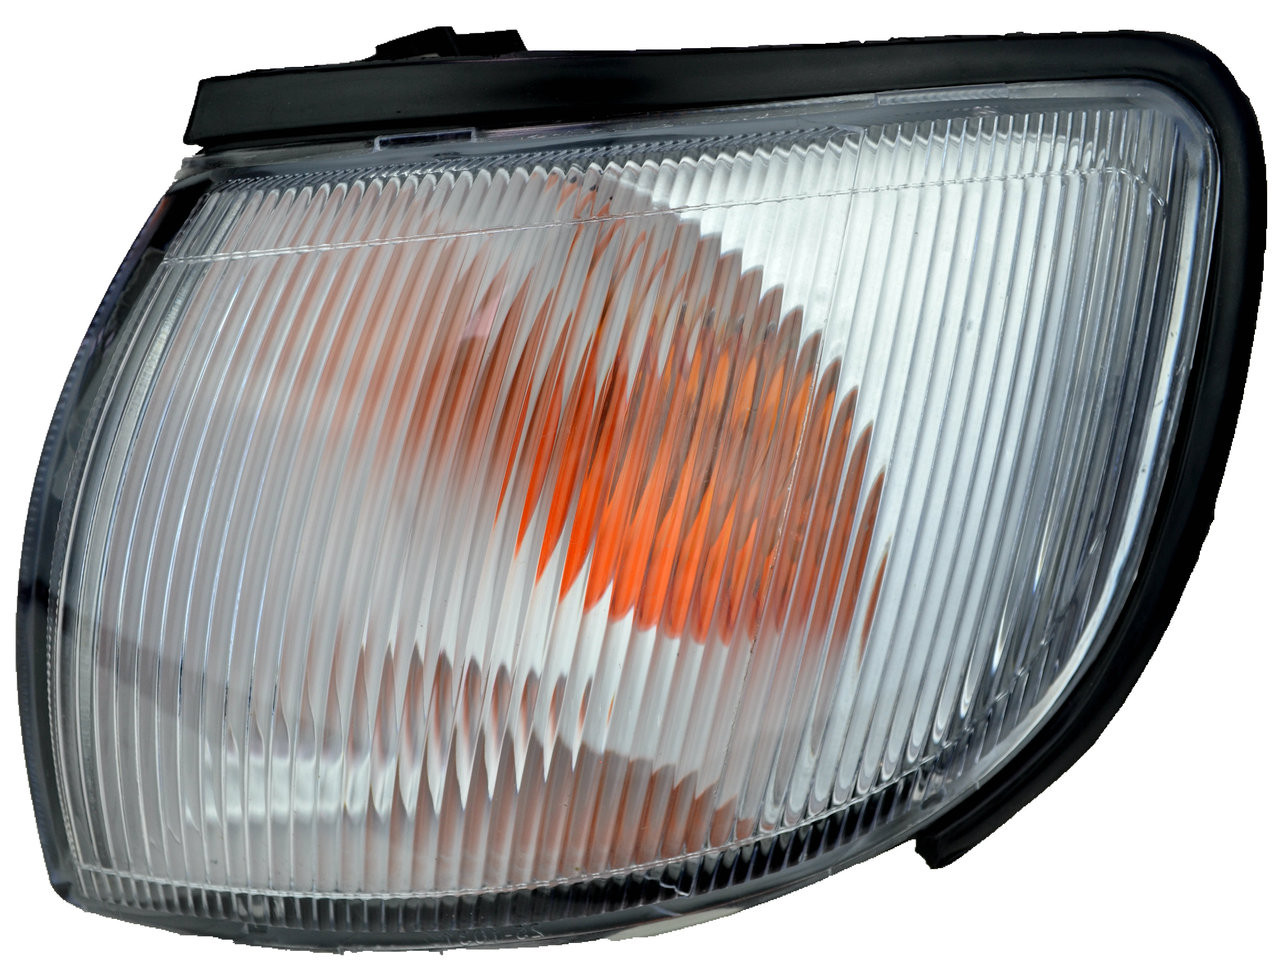 98 nissan maxima headlight bulb